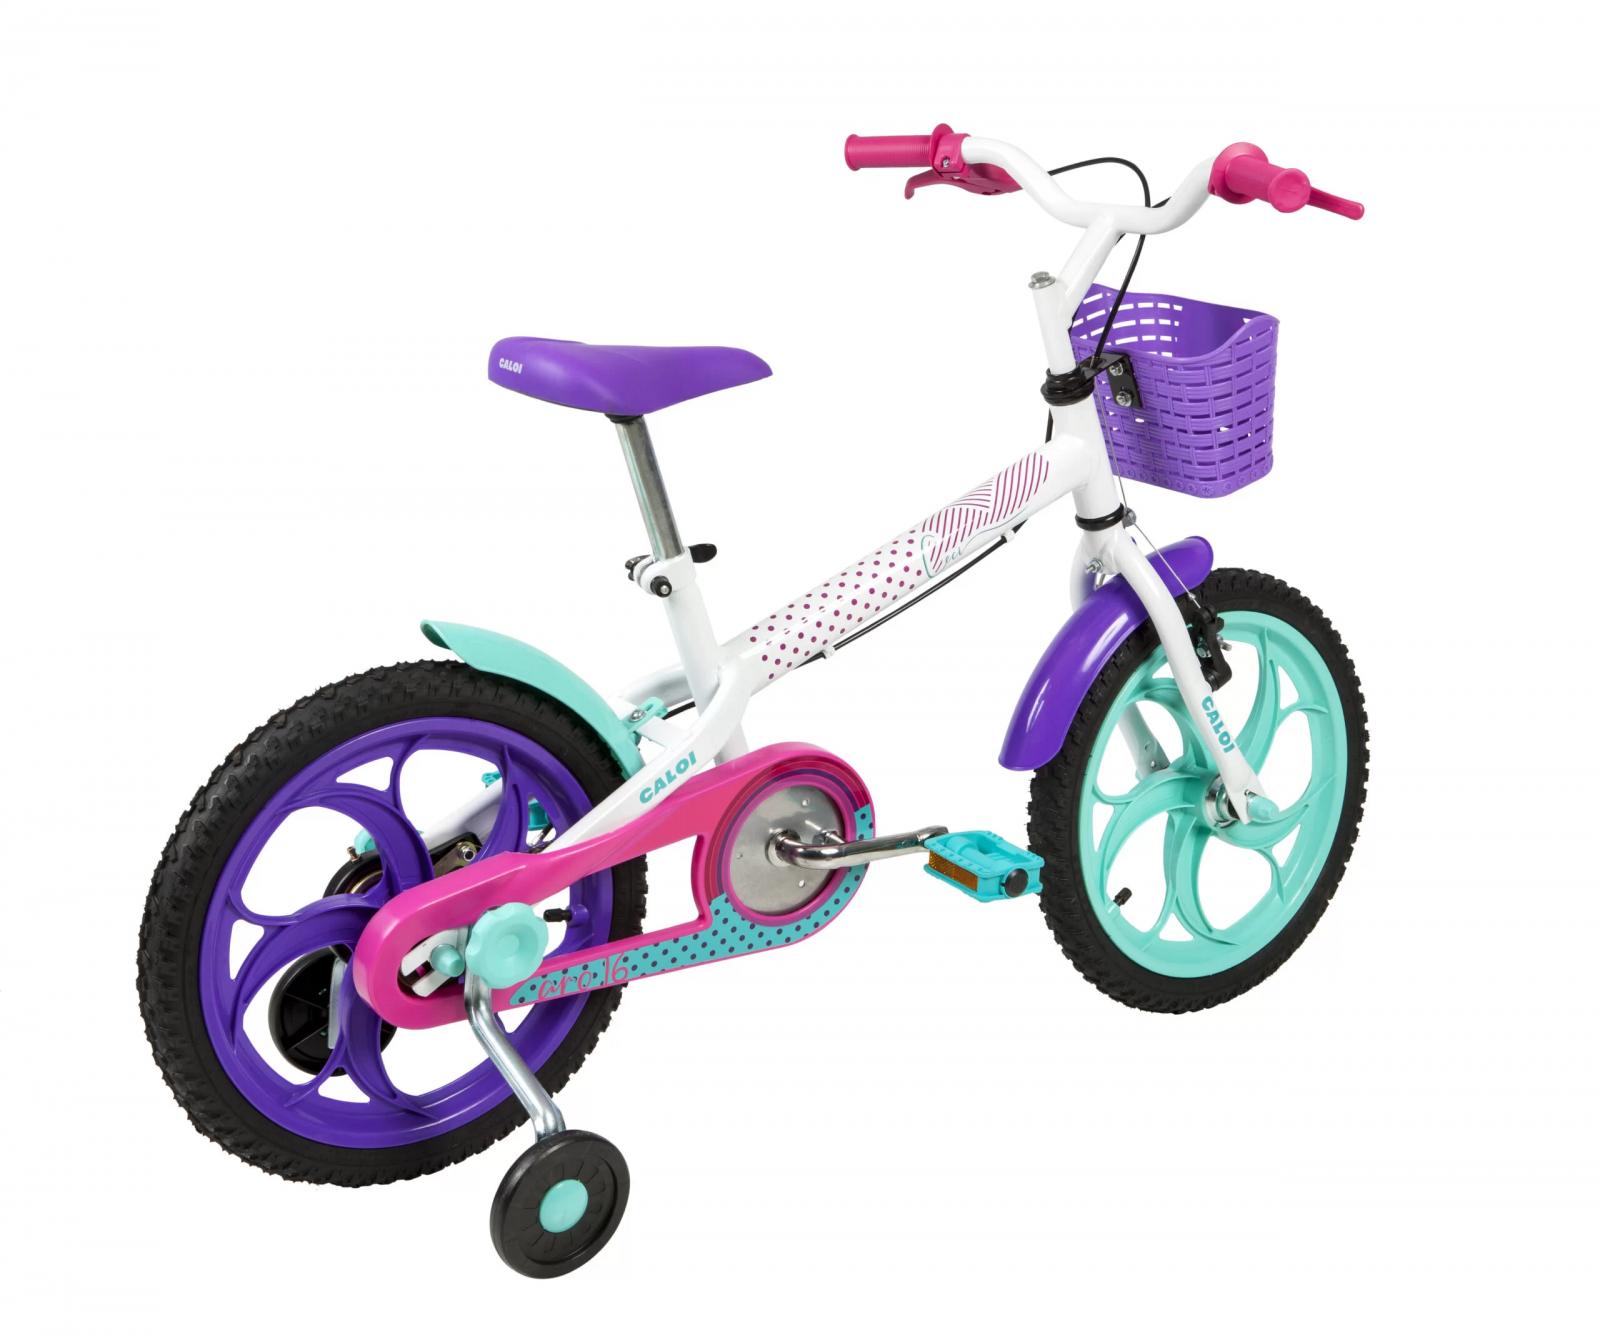 BICICLETA INFANTIL ARO 16 CALOI CECI 2020 - Cicles Jahn